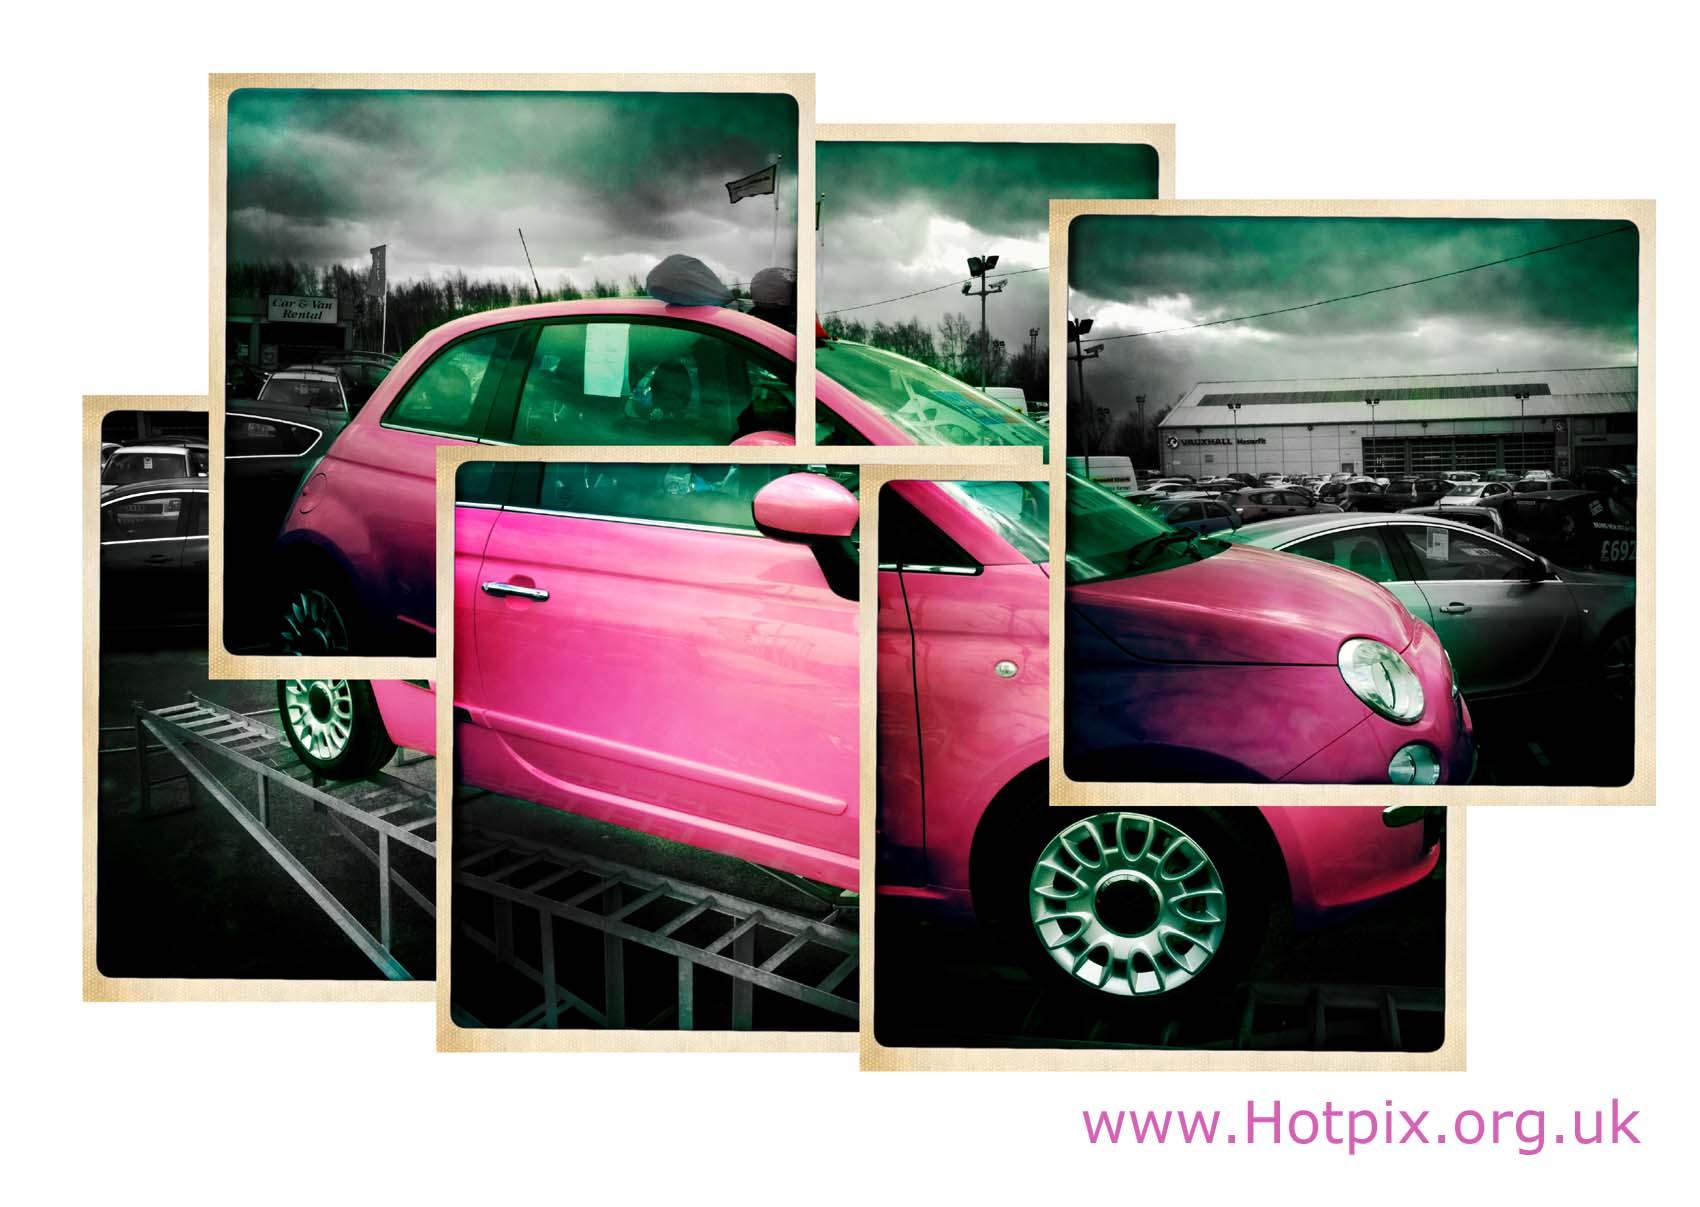 music,pink,car,fiat,500,uk,england,joiner,pano,interesting,panorama,hockney,hockny,david,tony,smith,sexy,tonysmith,girlie,hotpix,tonysmithhotpix,girl,lady,automobile,hotpics,hotpicks,hot,picks,pics,pix,hipstamatic,iphone,funky,1960s,1960,hotpix.com,#tonysmithotpix,hotpix.rocketmail.com,hotpixuk.rocketmail.com,contact.tony.smith.gmail.com,tony.smith.gmail.com,tonys@miscs.com,tony.smith@mis-ams.com